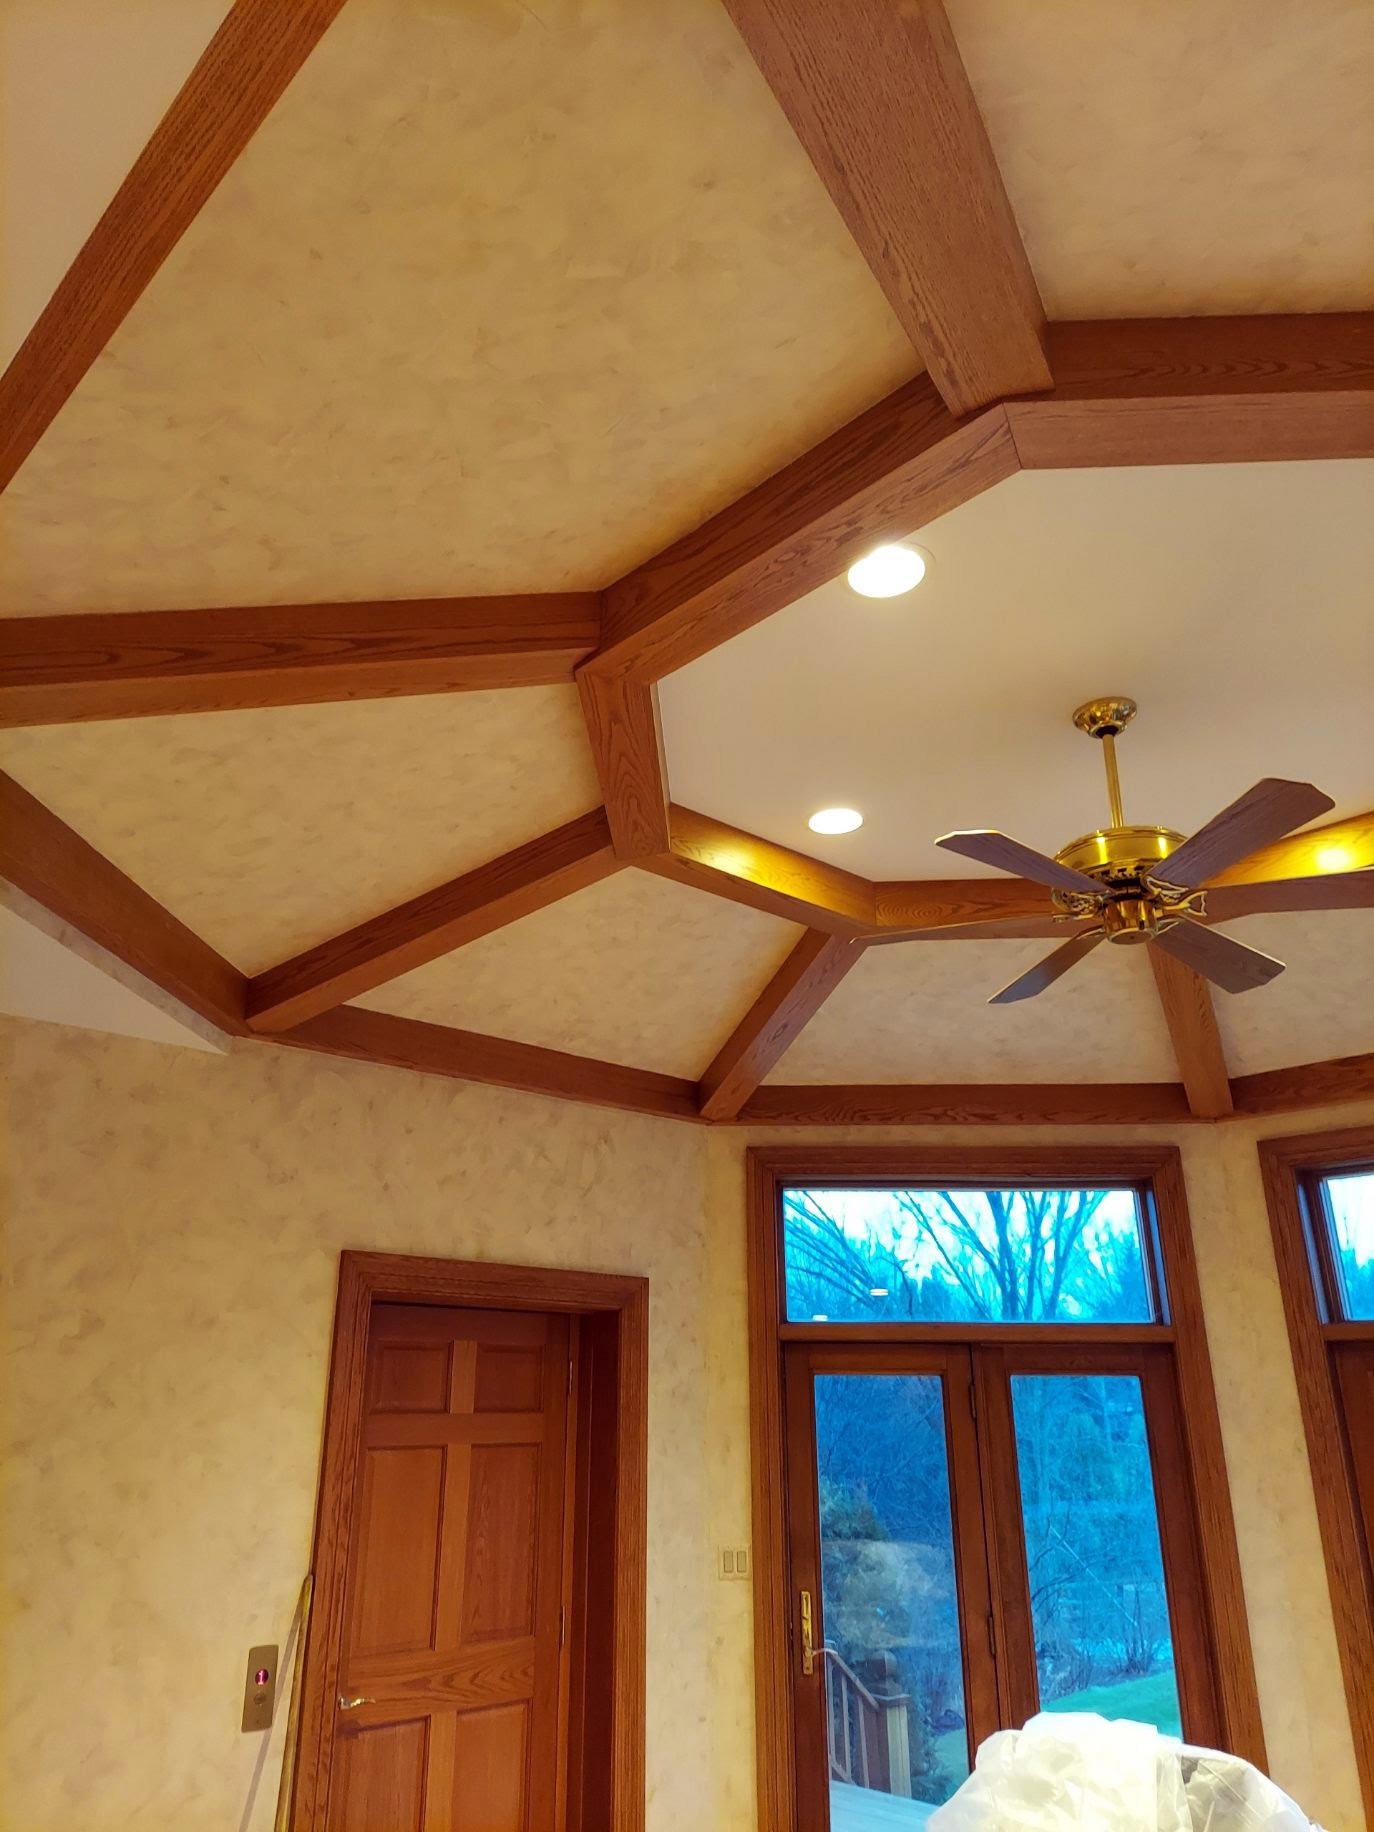 Wooden insert ceiling